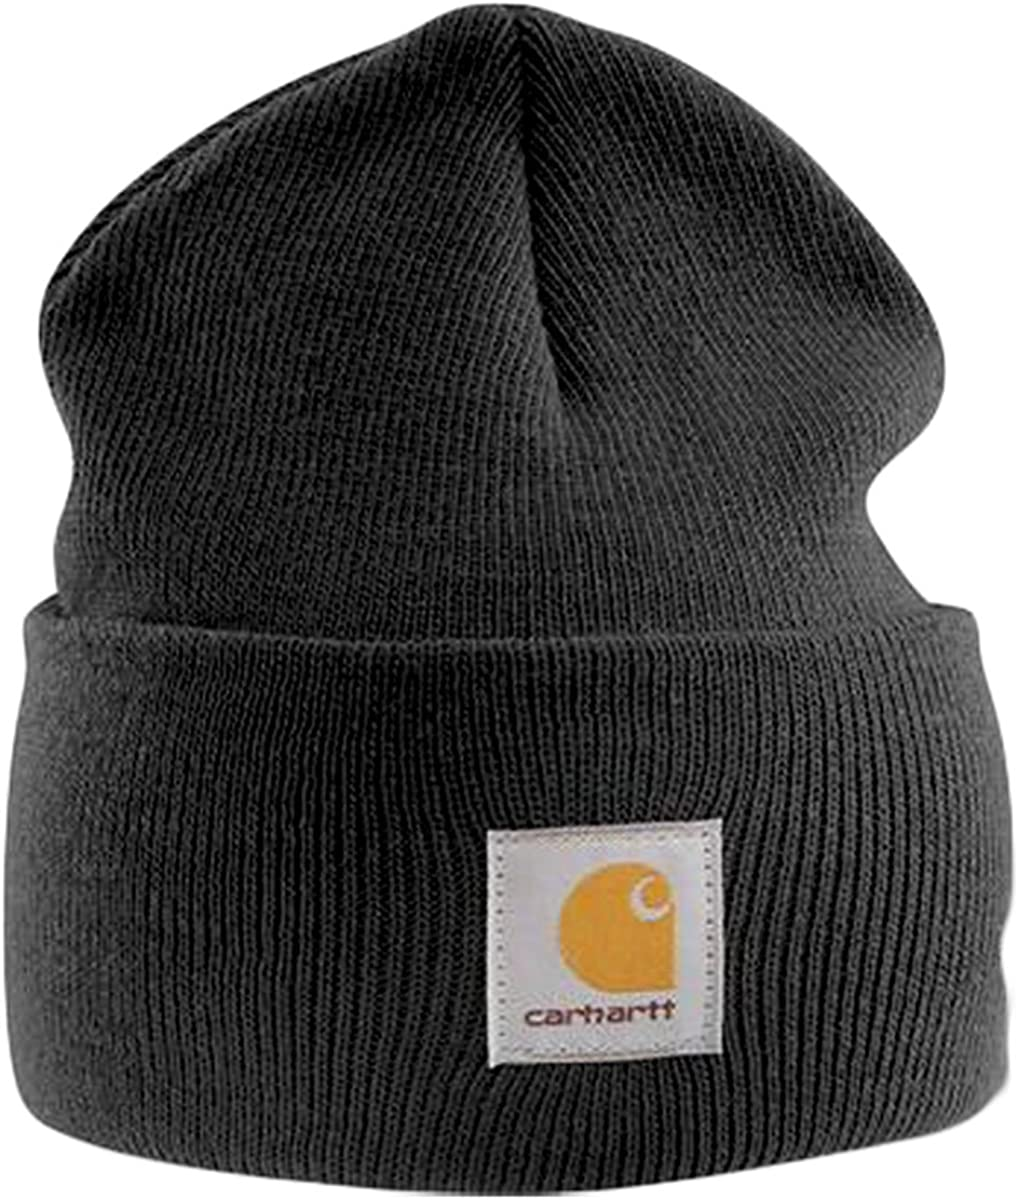 Carhartt Gorro Beanie Acrílico Negro A18BLK Sombrero: Amazon.es ...